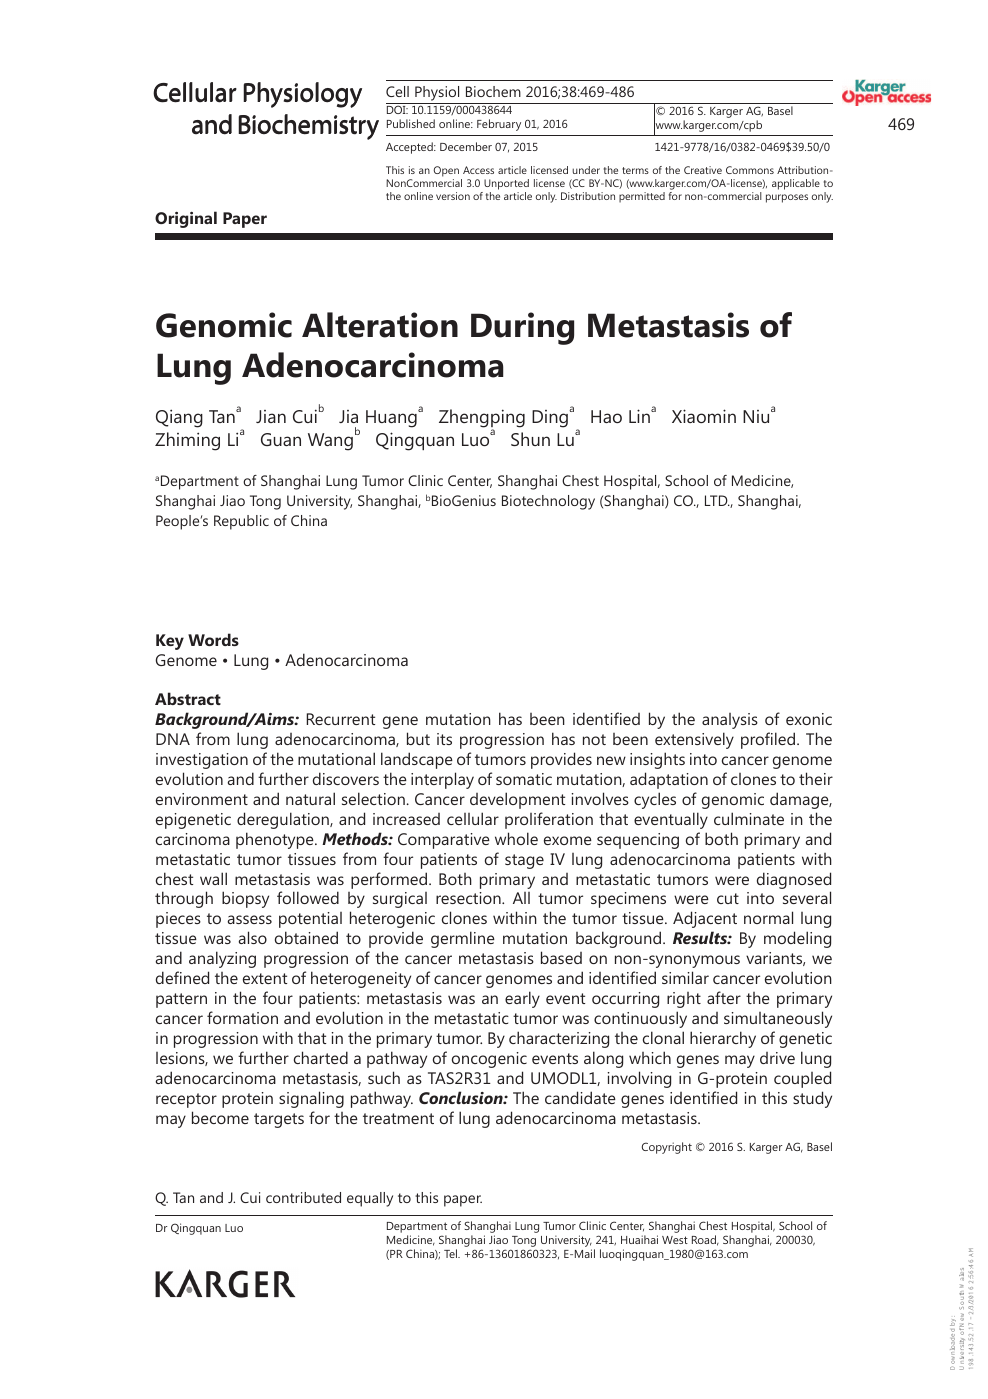 foto de Genomic Alteration During Metastasis of Lung Adenocarcinoma ...